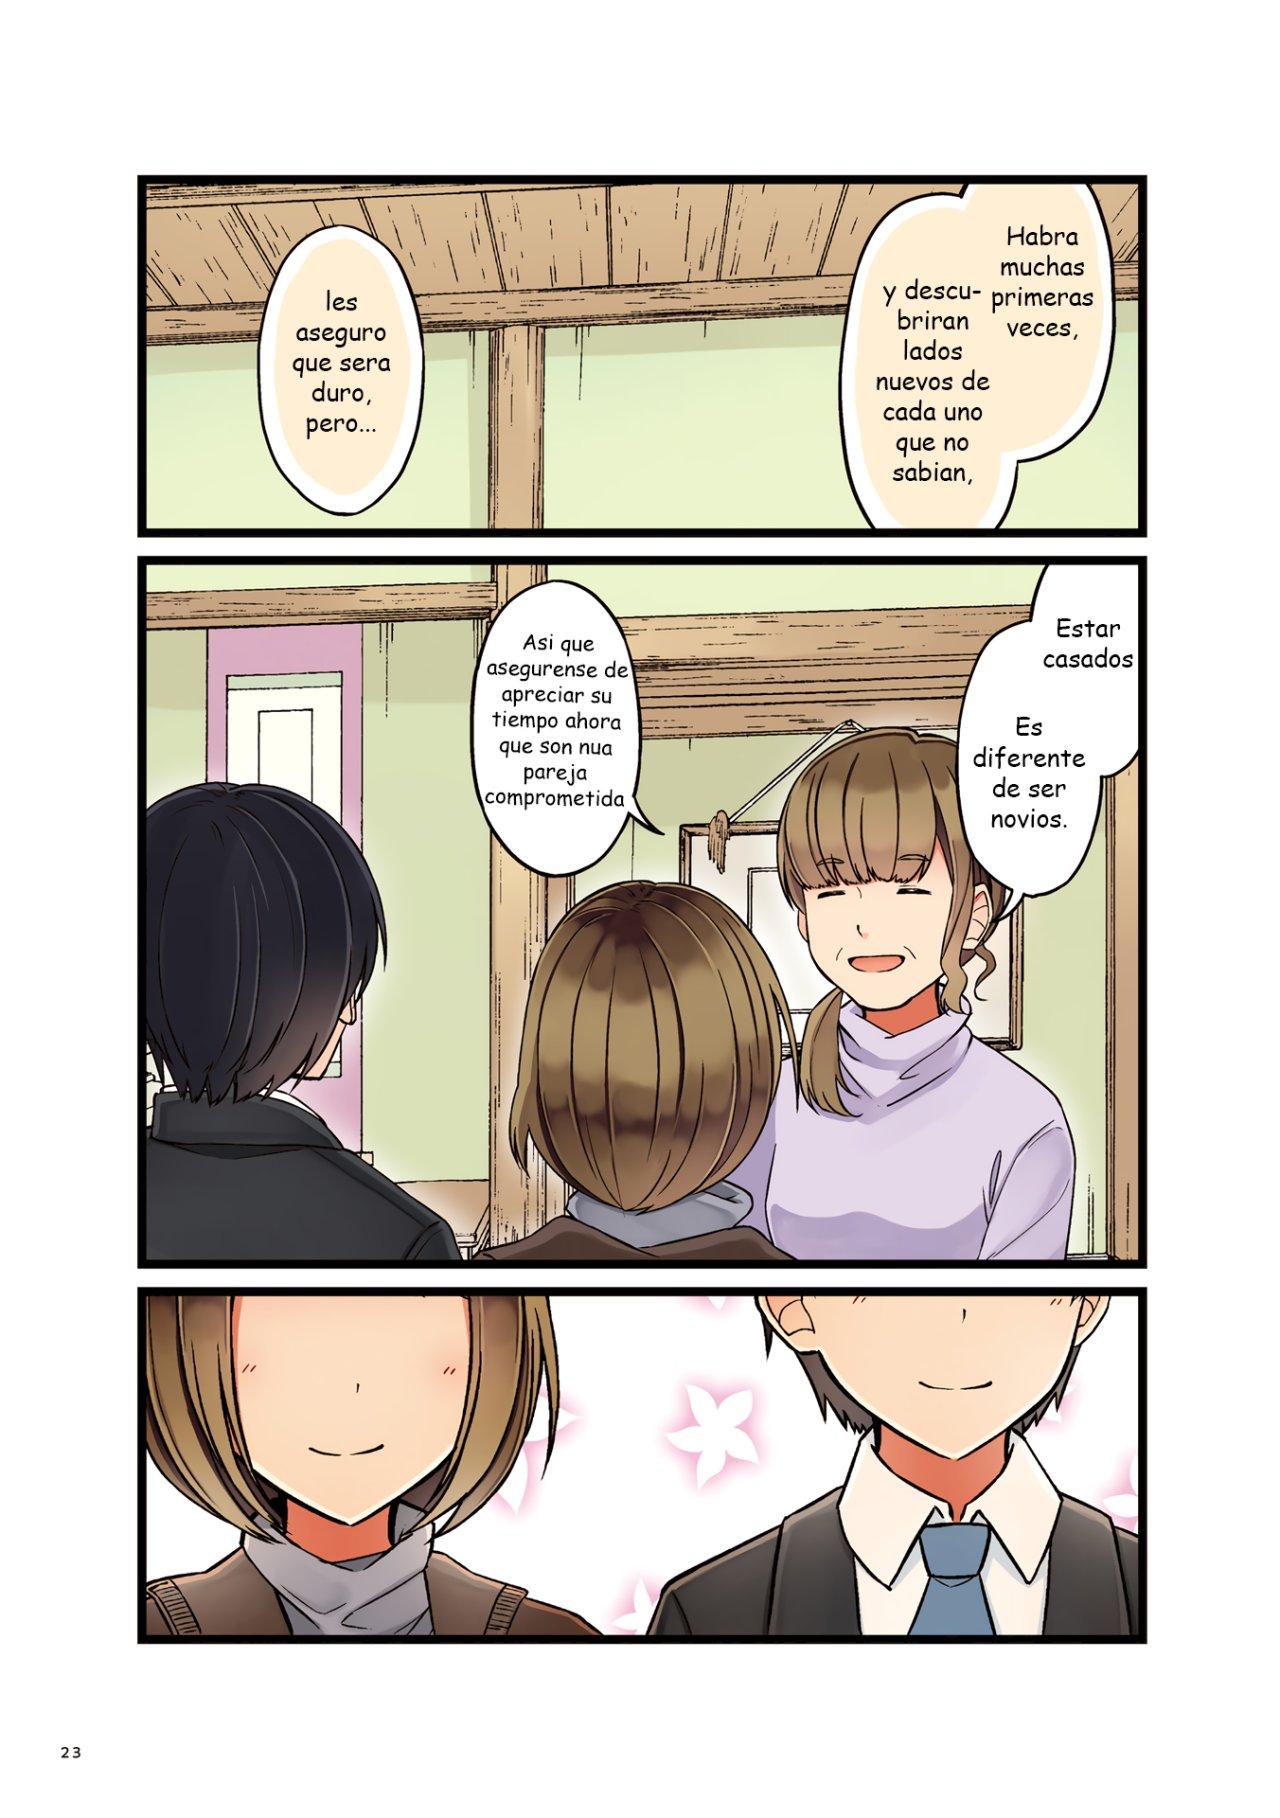 https://nine.mangadogs.com/es_manga/pic8/60/36668/946546/62afbc57ab75791a38f7d727efa90fc7.jpg Page 20